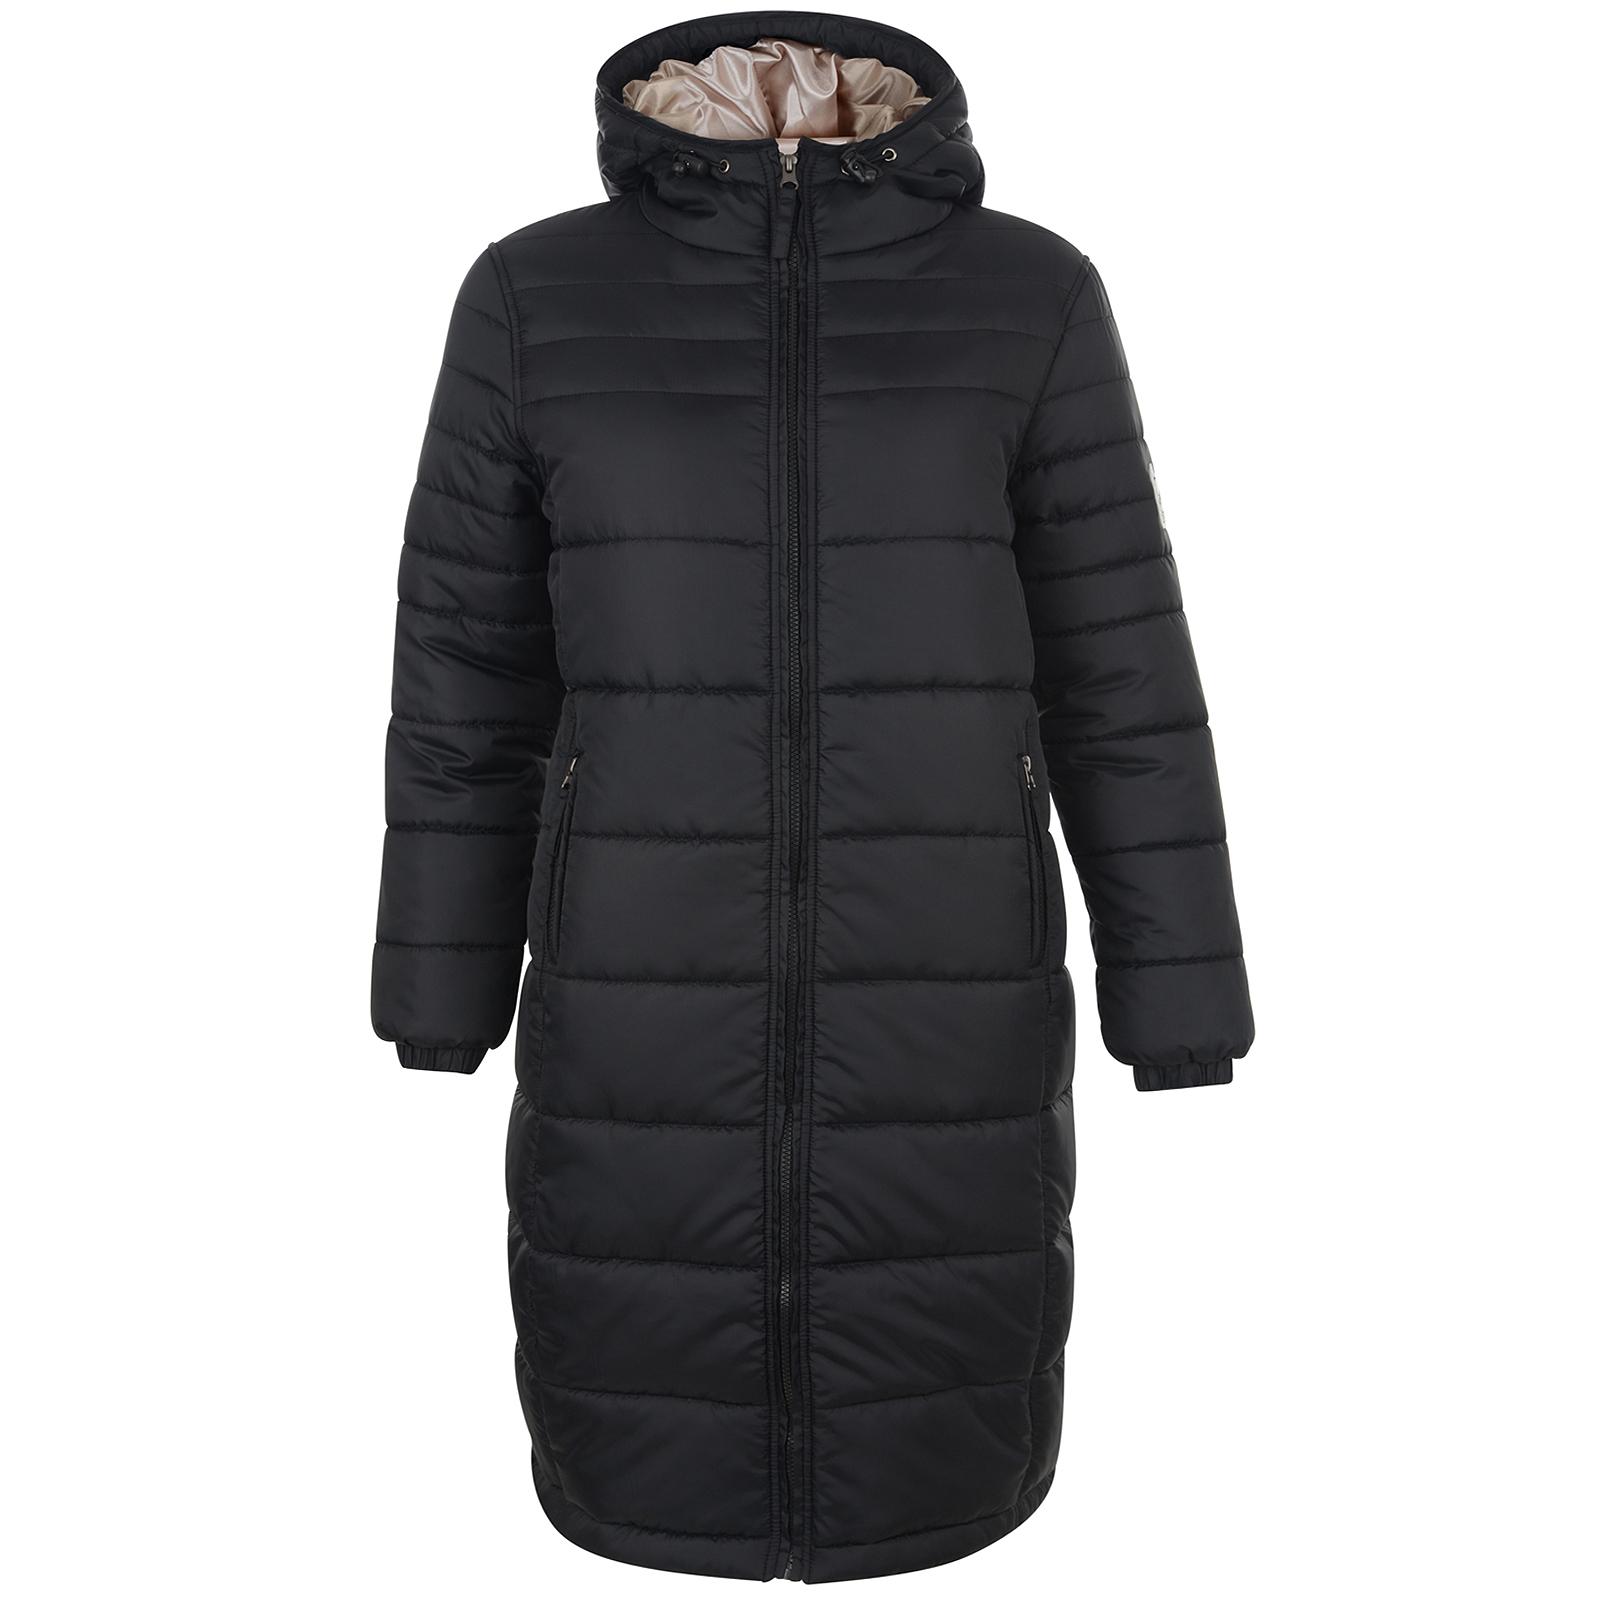 Womens Sleeping Bag Jacket Bellfield New Winter Warm ...